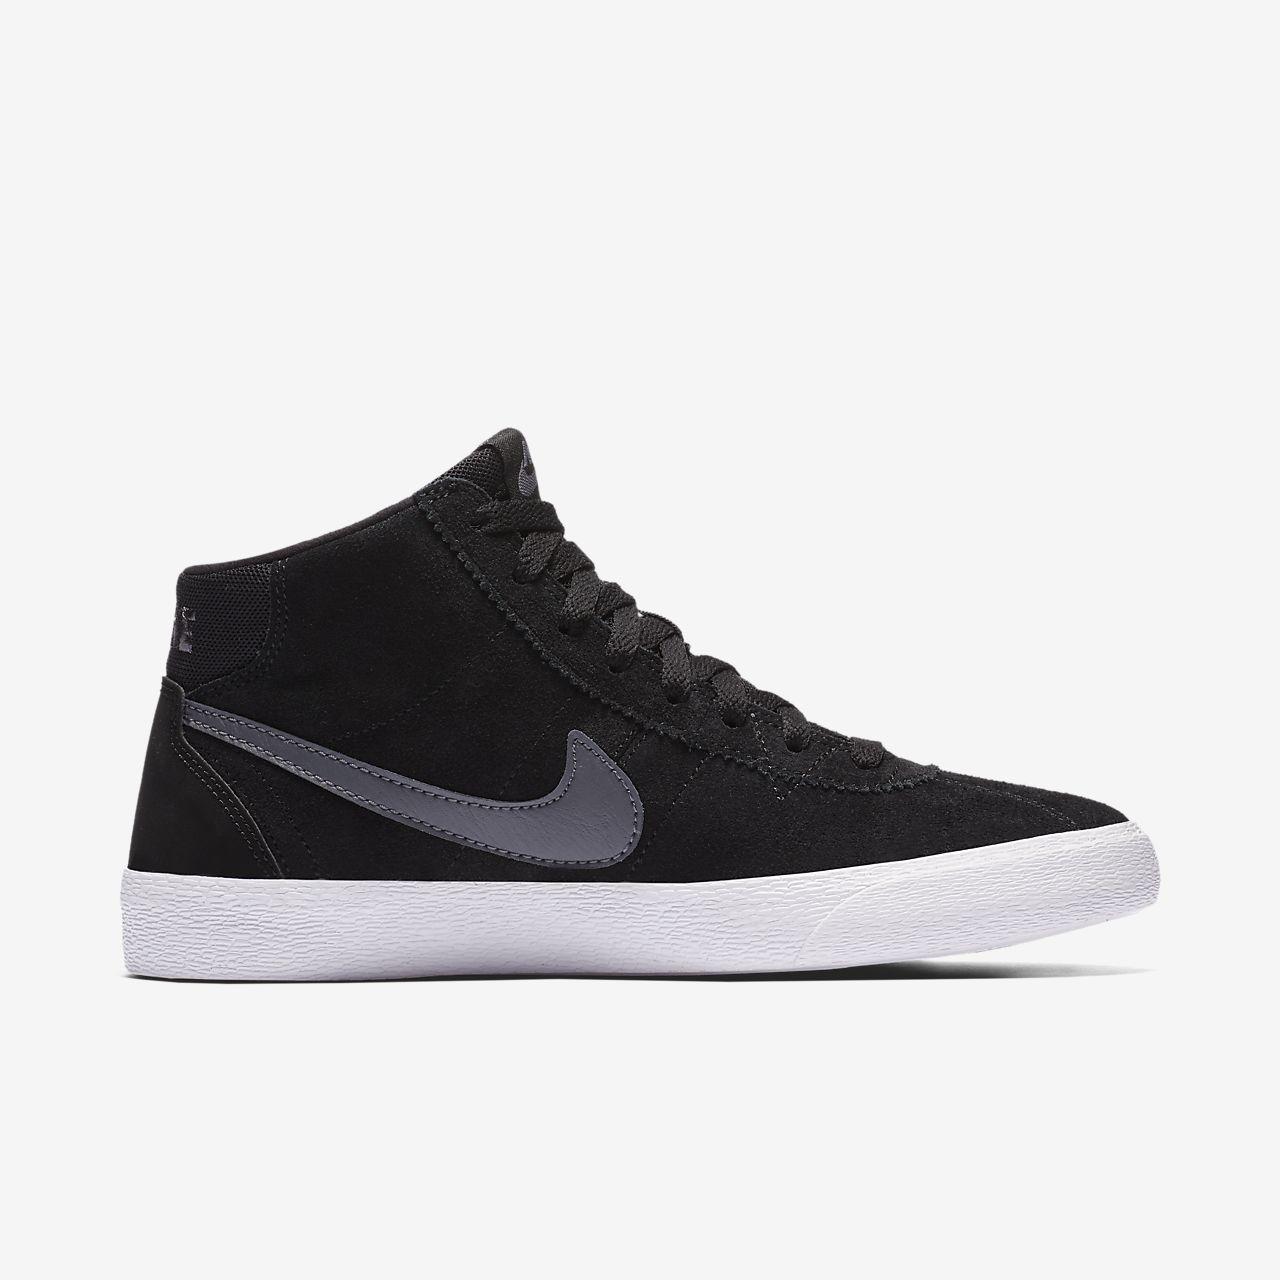 Nike SB Bruin High Women's Skateboarding Shoe Size 10.5